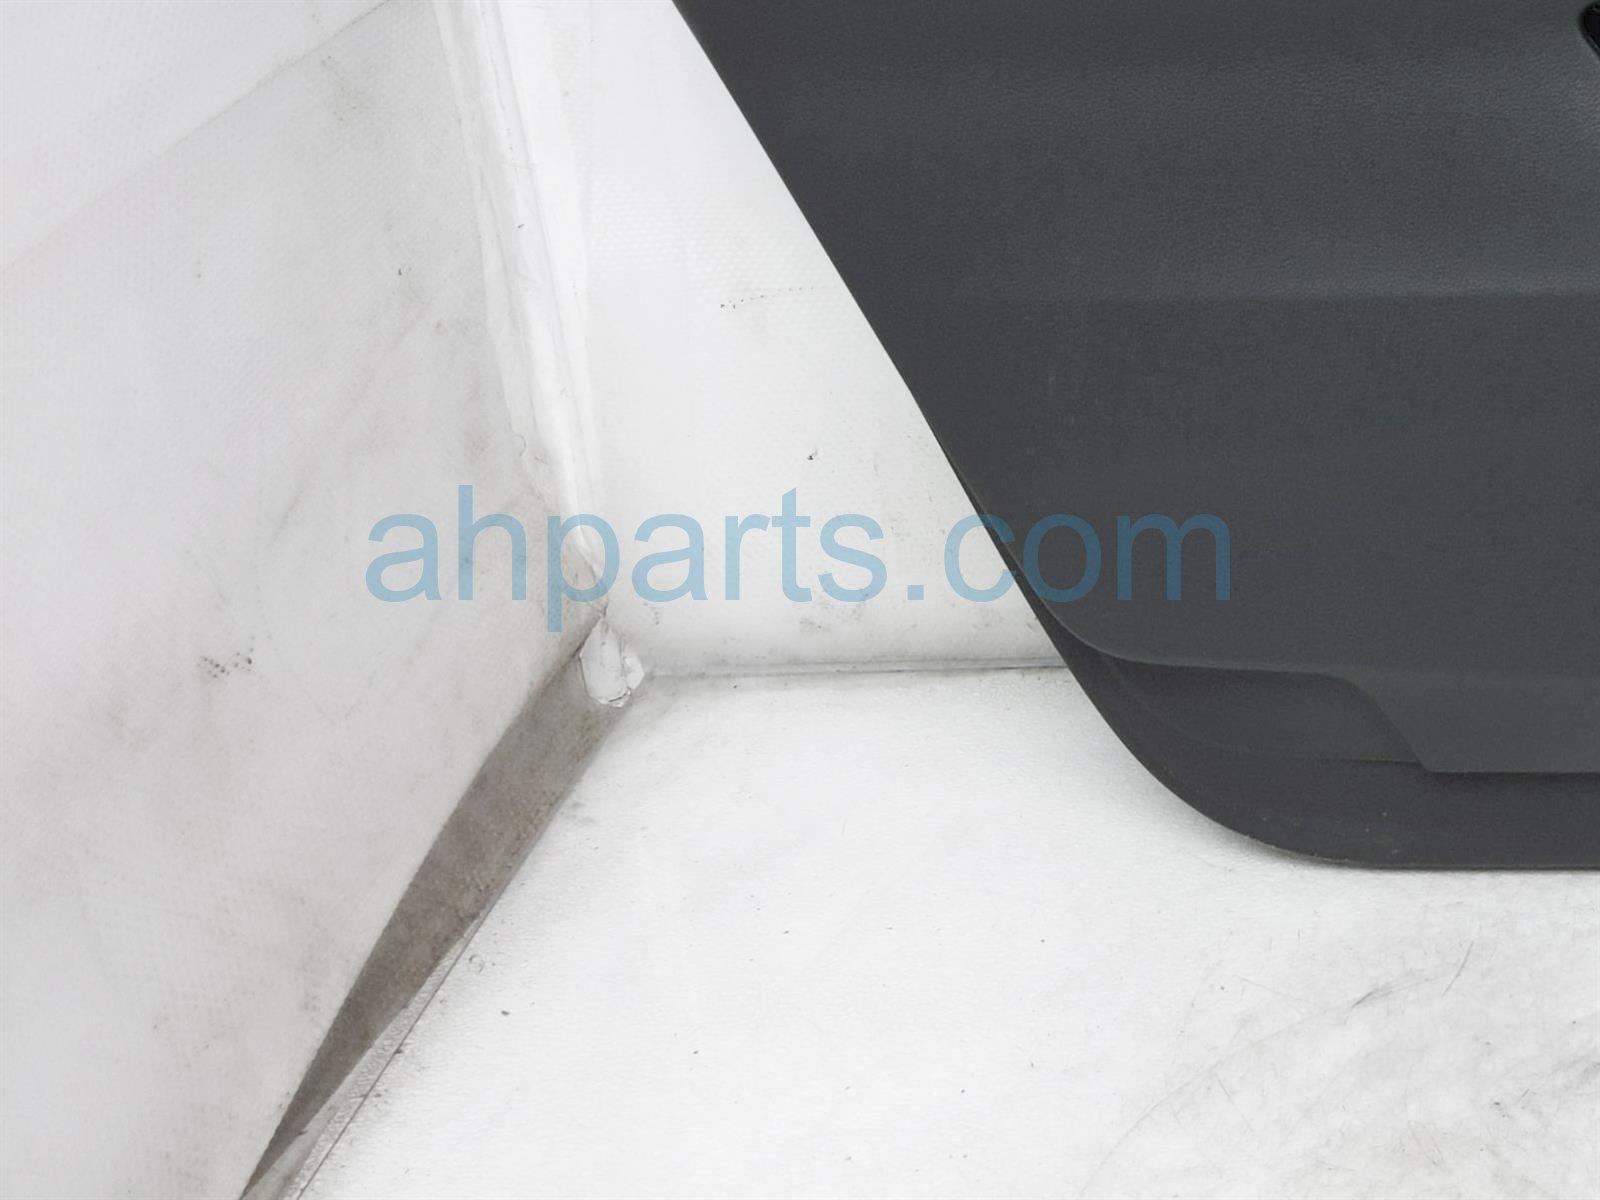 2019 Honda Passport Trim / Liner Rear Driver Interior Door Panel   Black 83751 TGS A61ZA Replacement